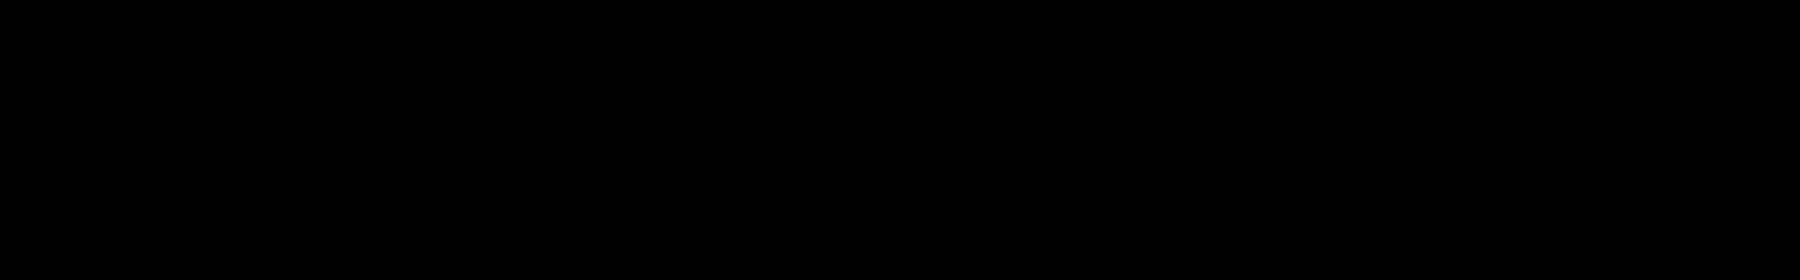 Reticence Phonk Drum Kit audio waveform